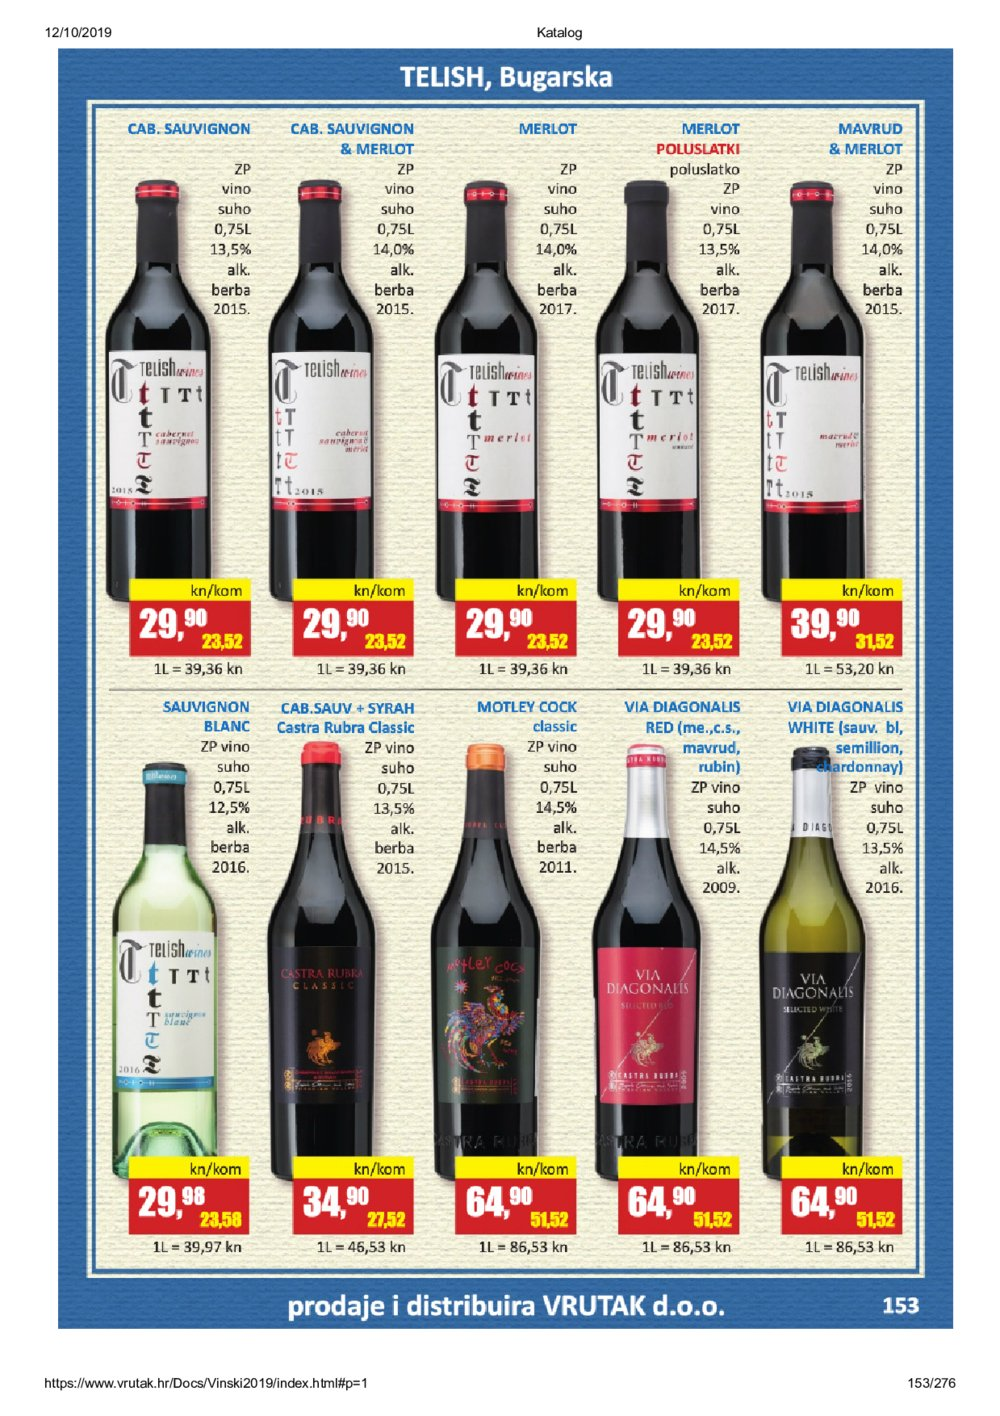 Vrutak vinski katalog 1.11.2019.-31.10.2020.